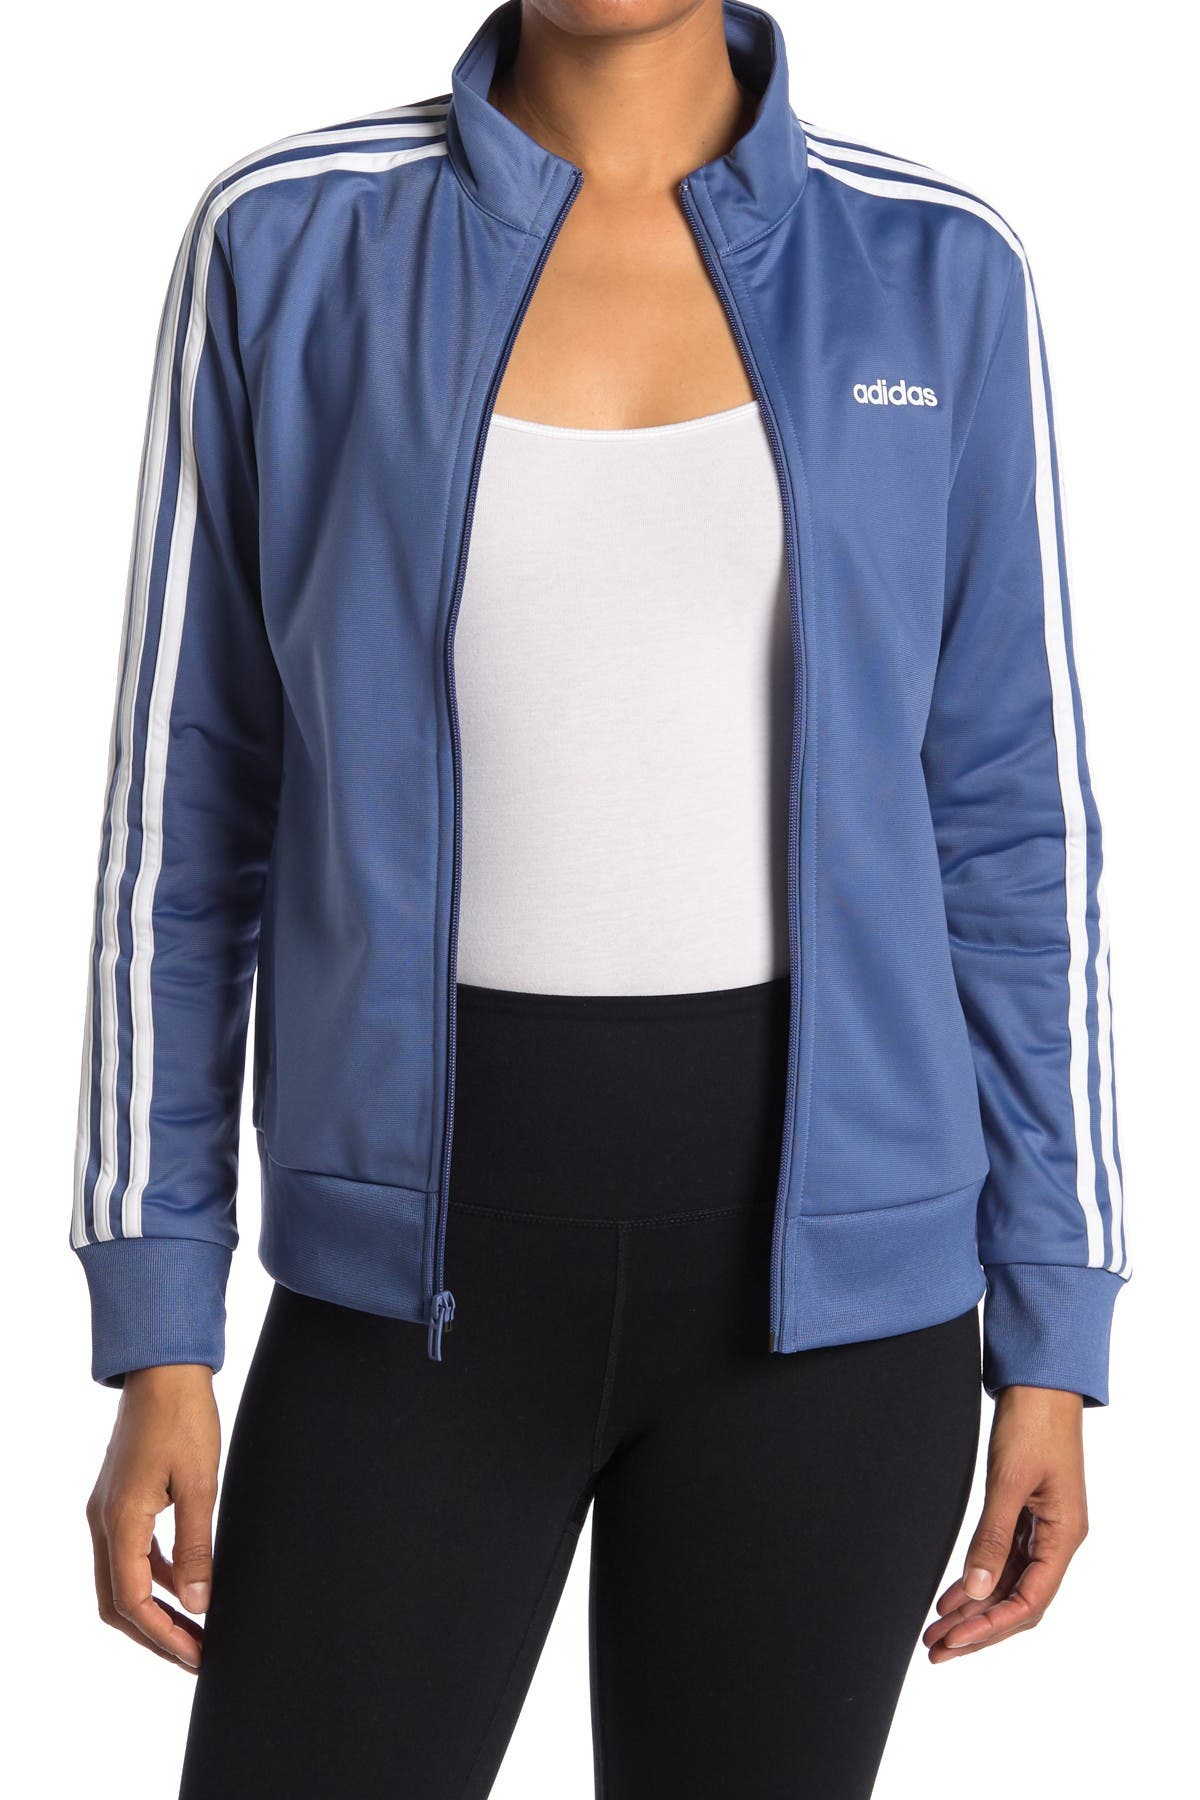 Image of adidas 3-Stripes Tricot Track Jacket